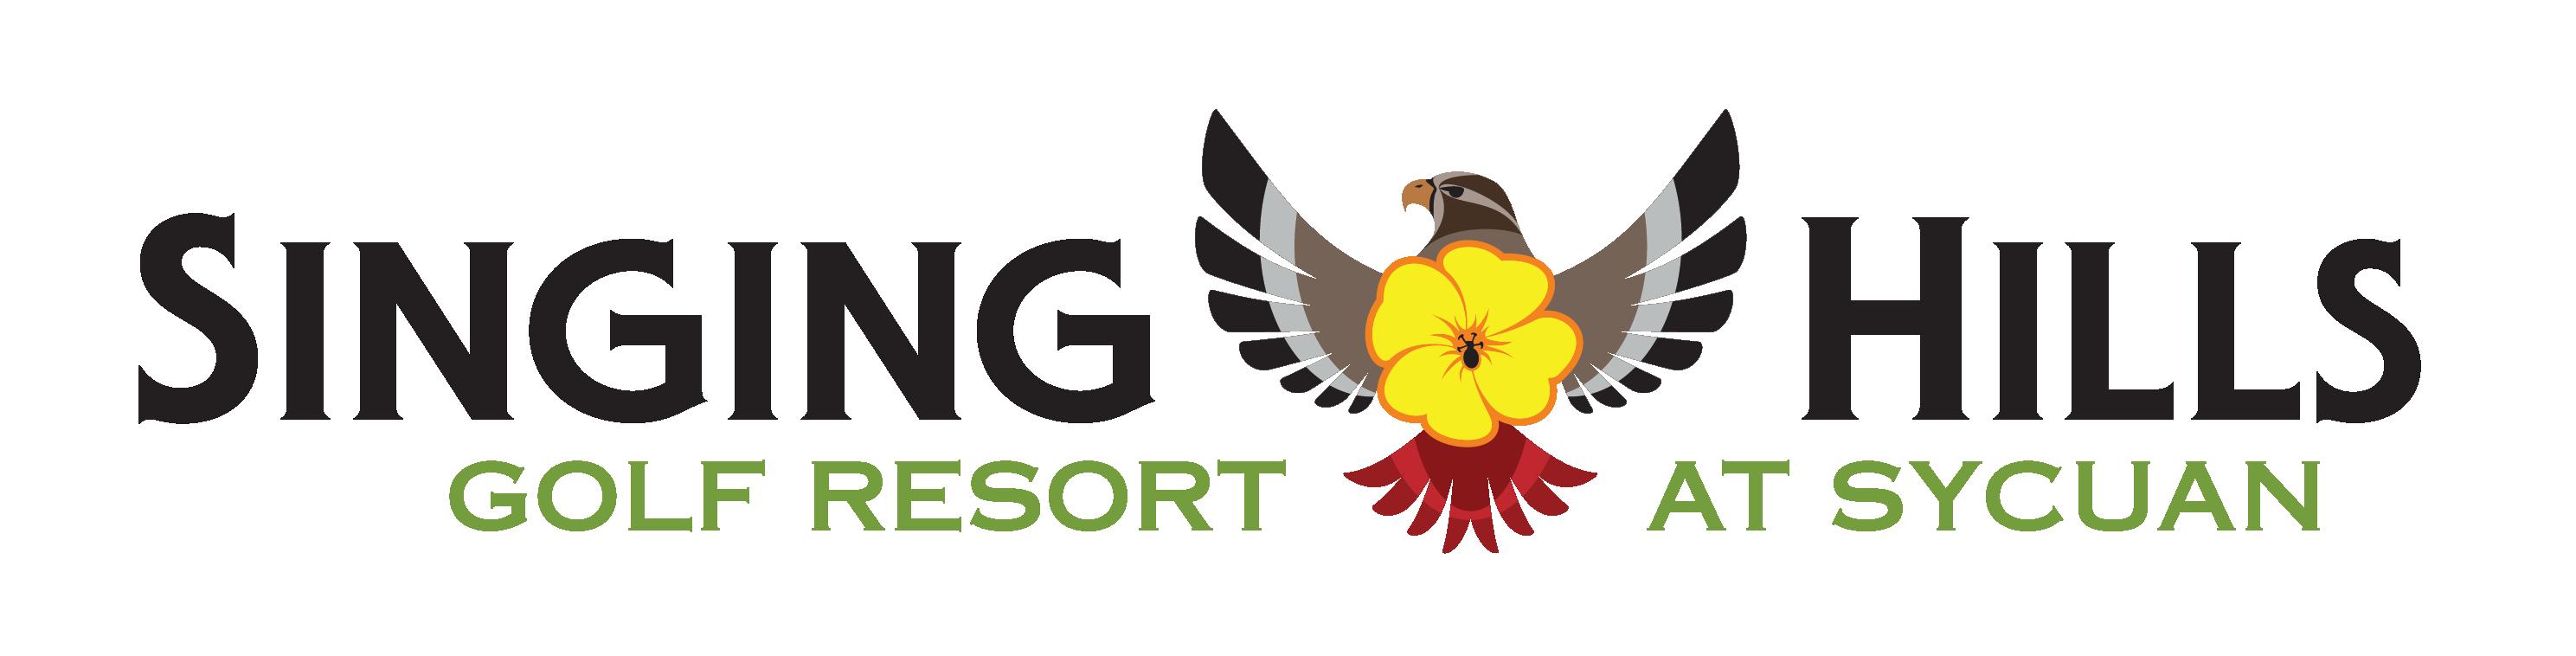 Singing Hills Golf Resort at Sycuan's Logo